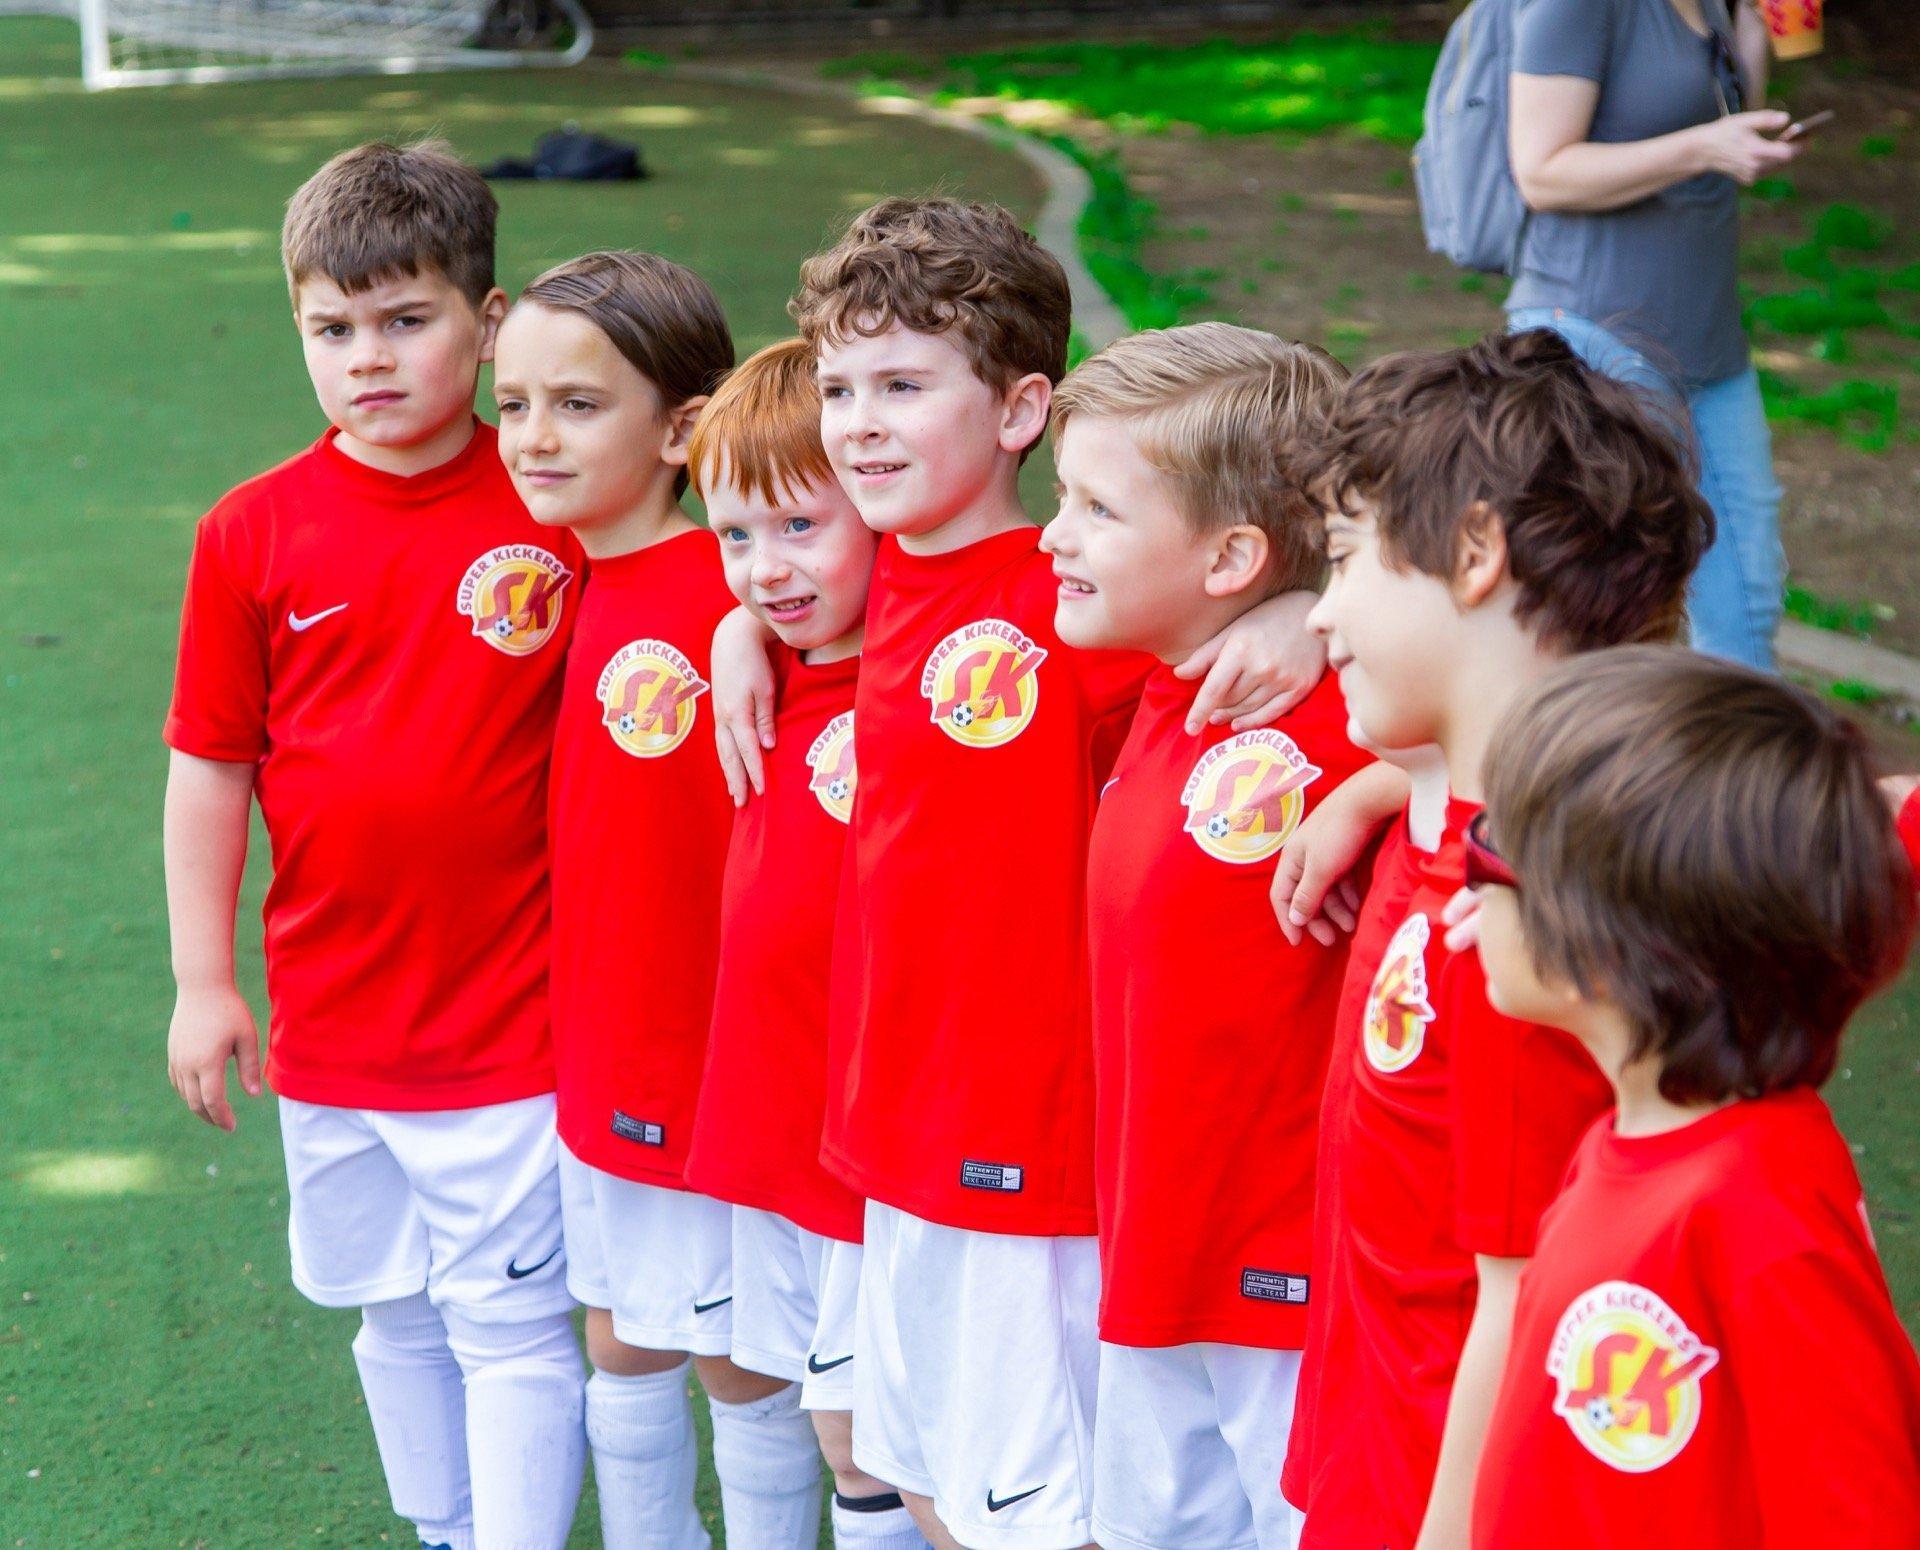 Super Kickers Advanced Soccer League 13